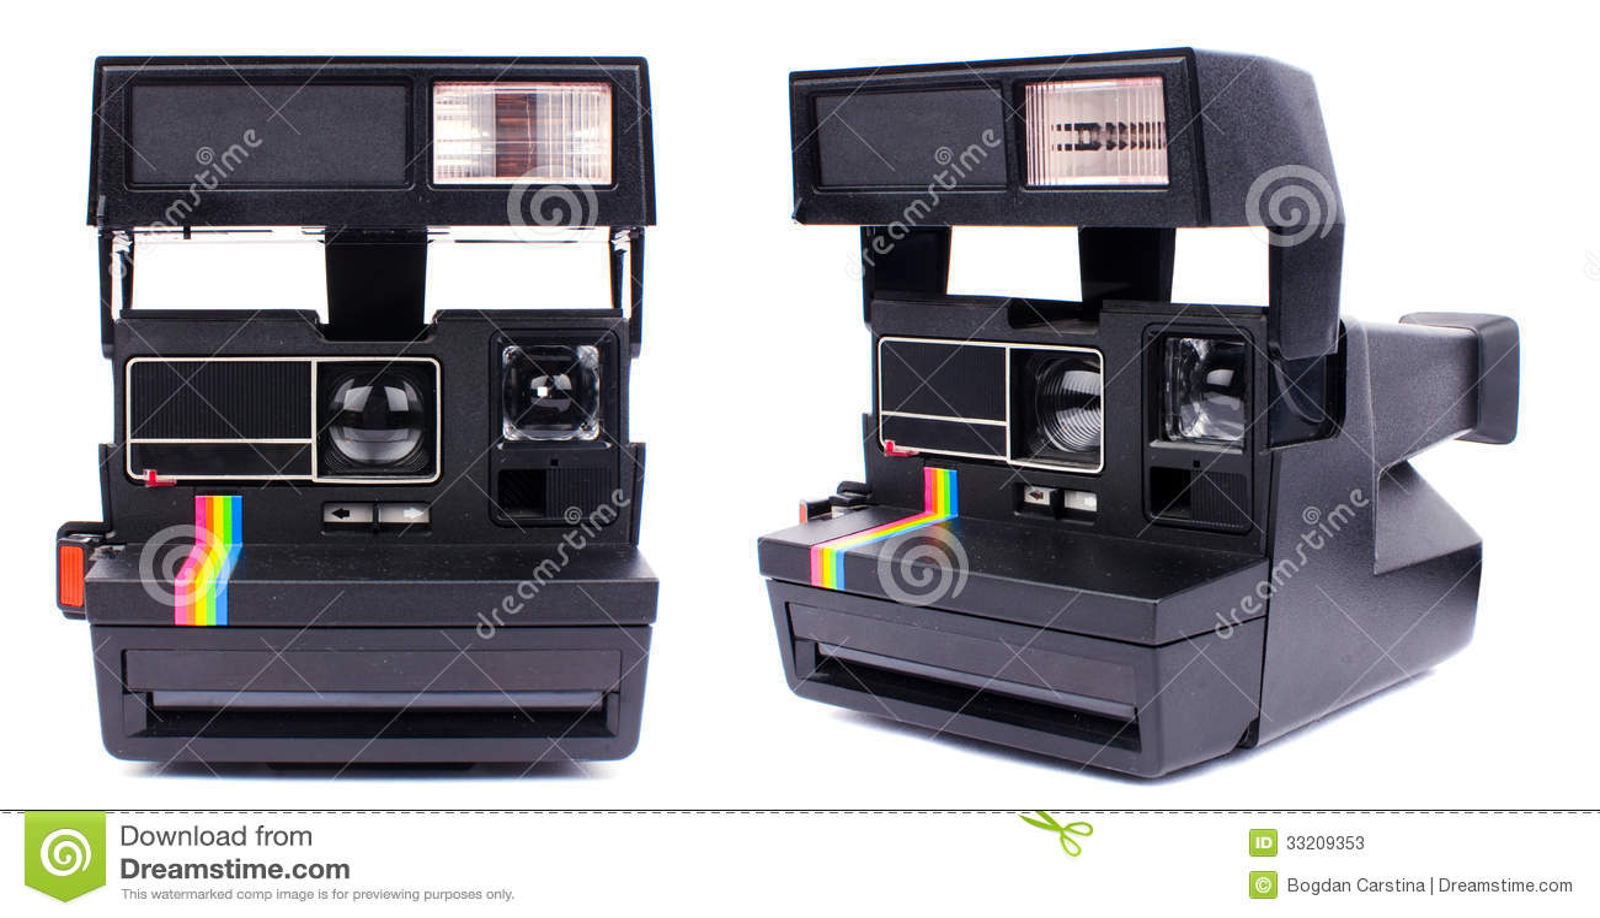 Polaroid camera stock image  Image of shutter, view